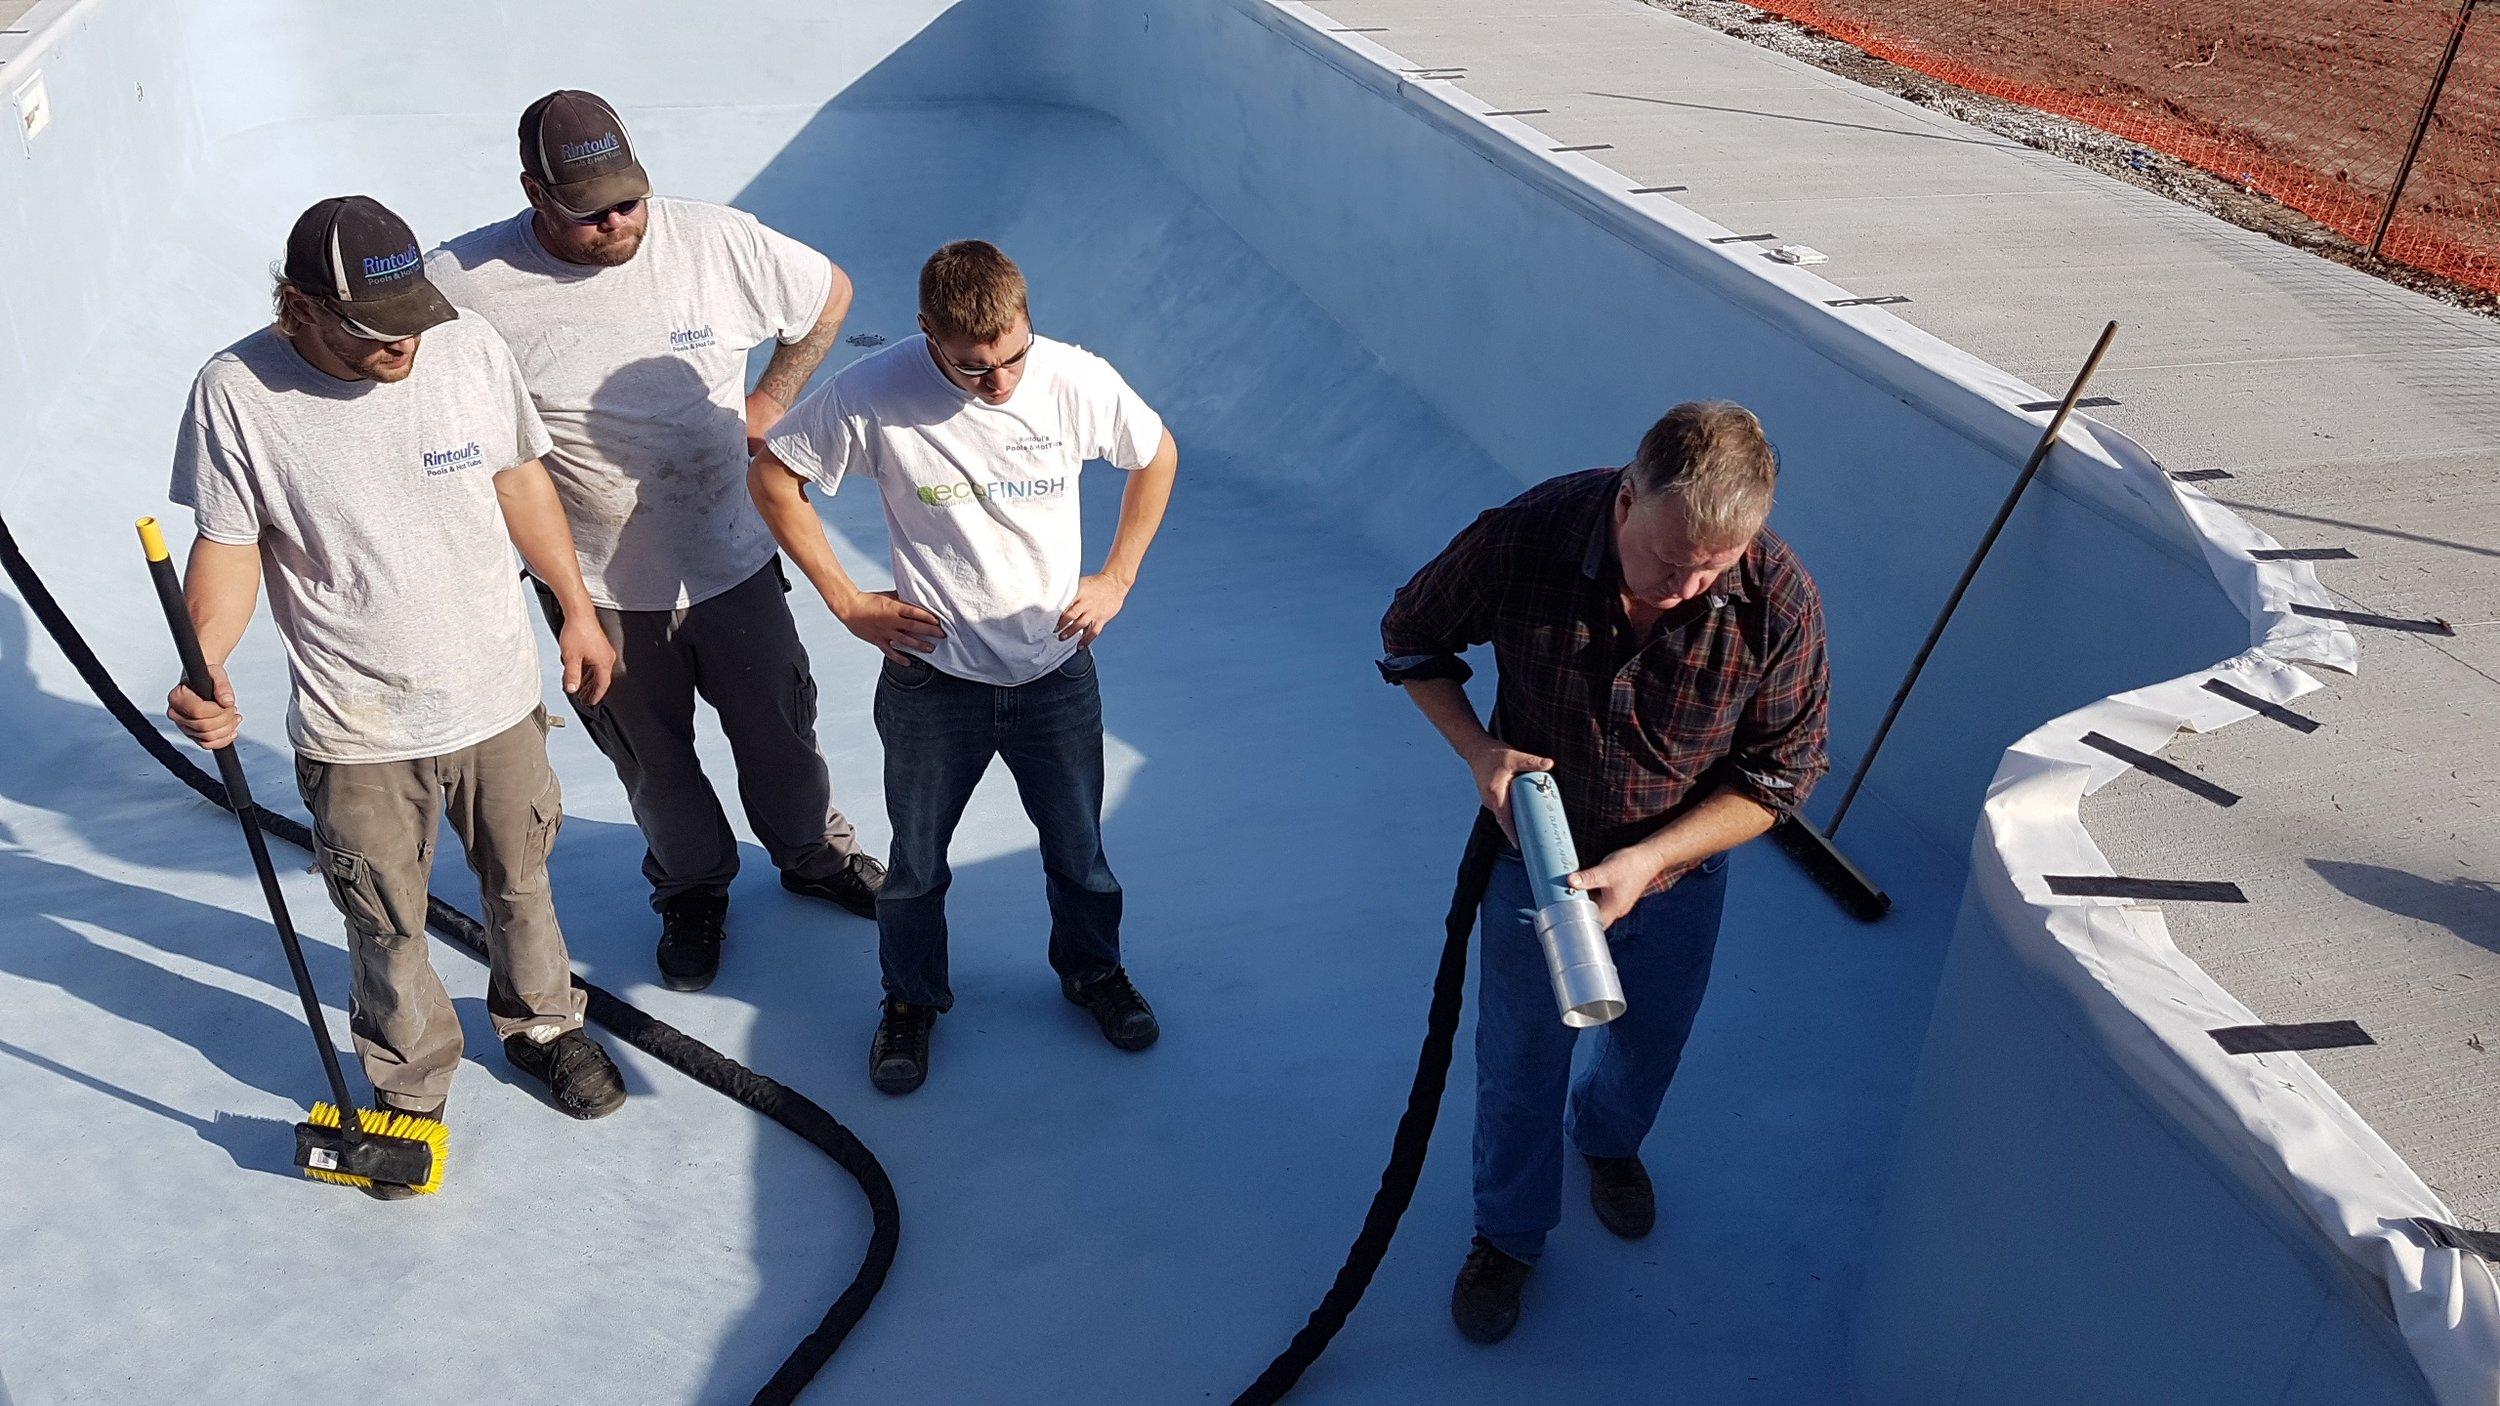 Canada Pool Coating Mike Cleary & Ontario Pool Coating team